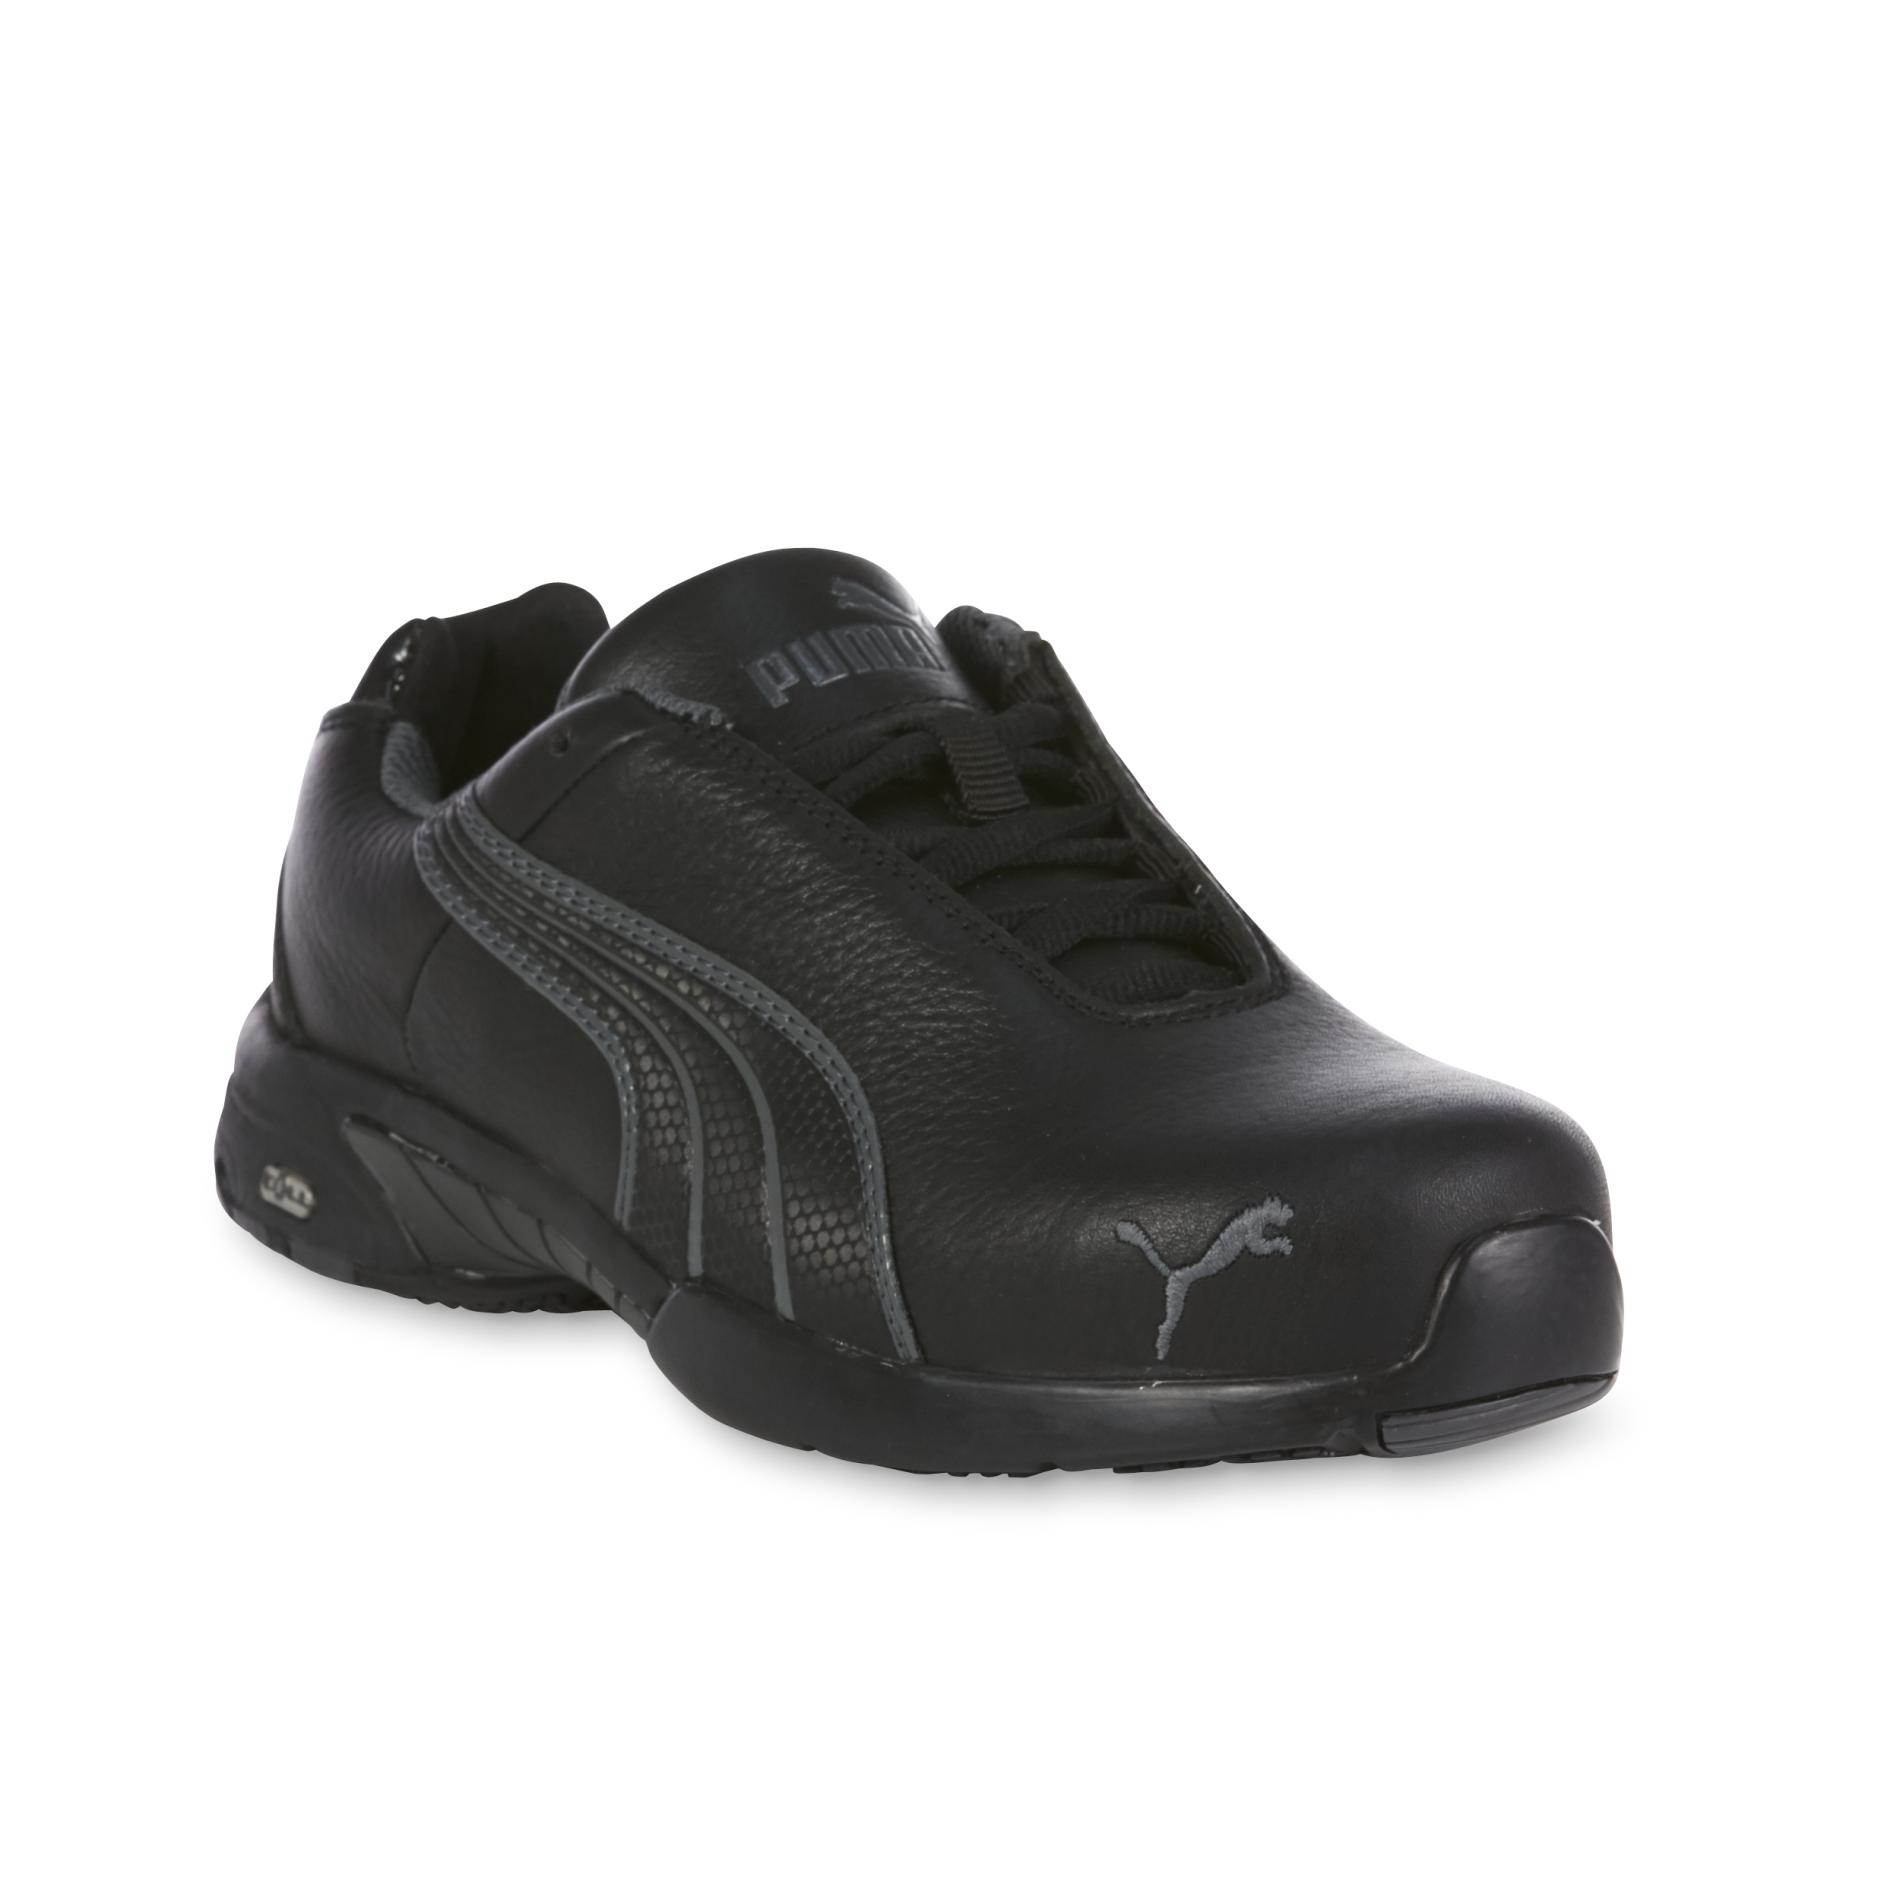 steel toe shoes for women puma safety womenu0027s velocity low black/gray steel toe static dissipative  work shoe nbopsaw